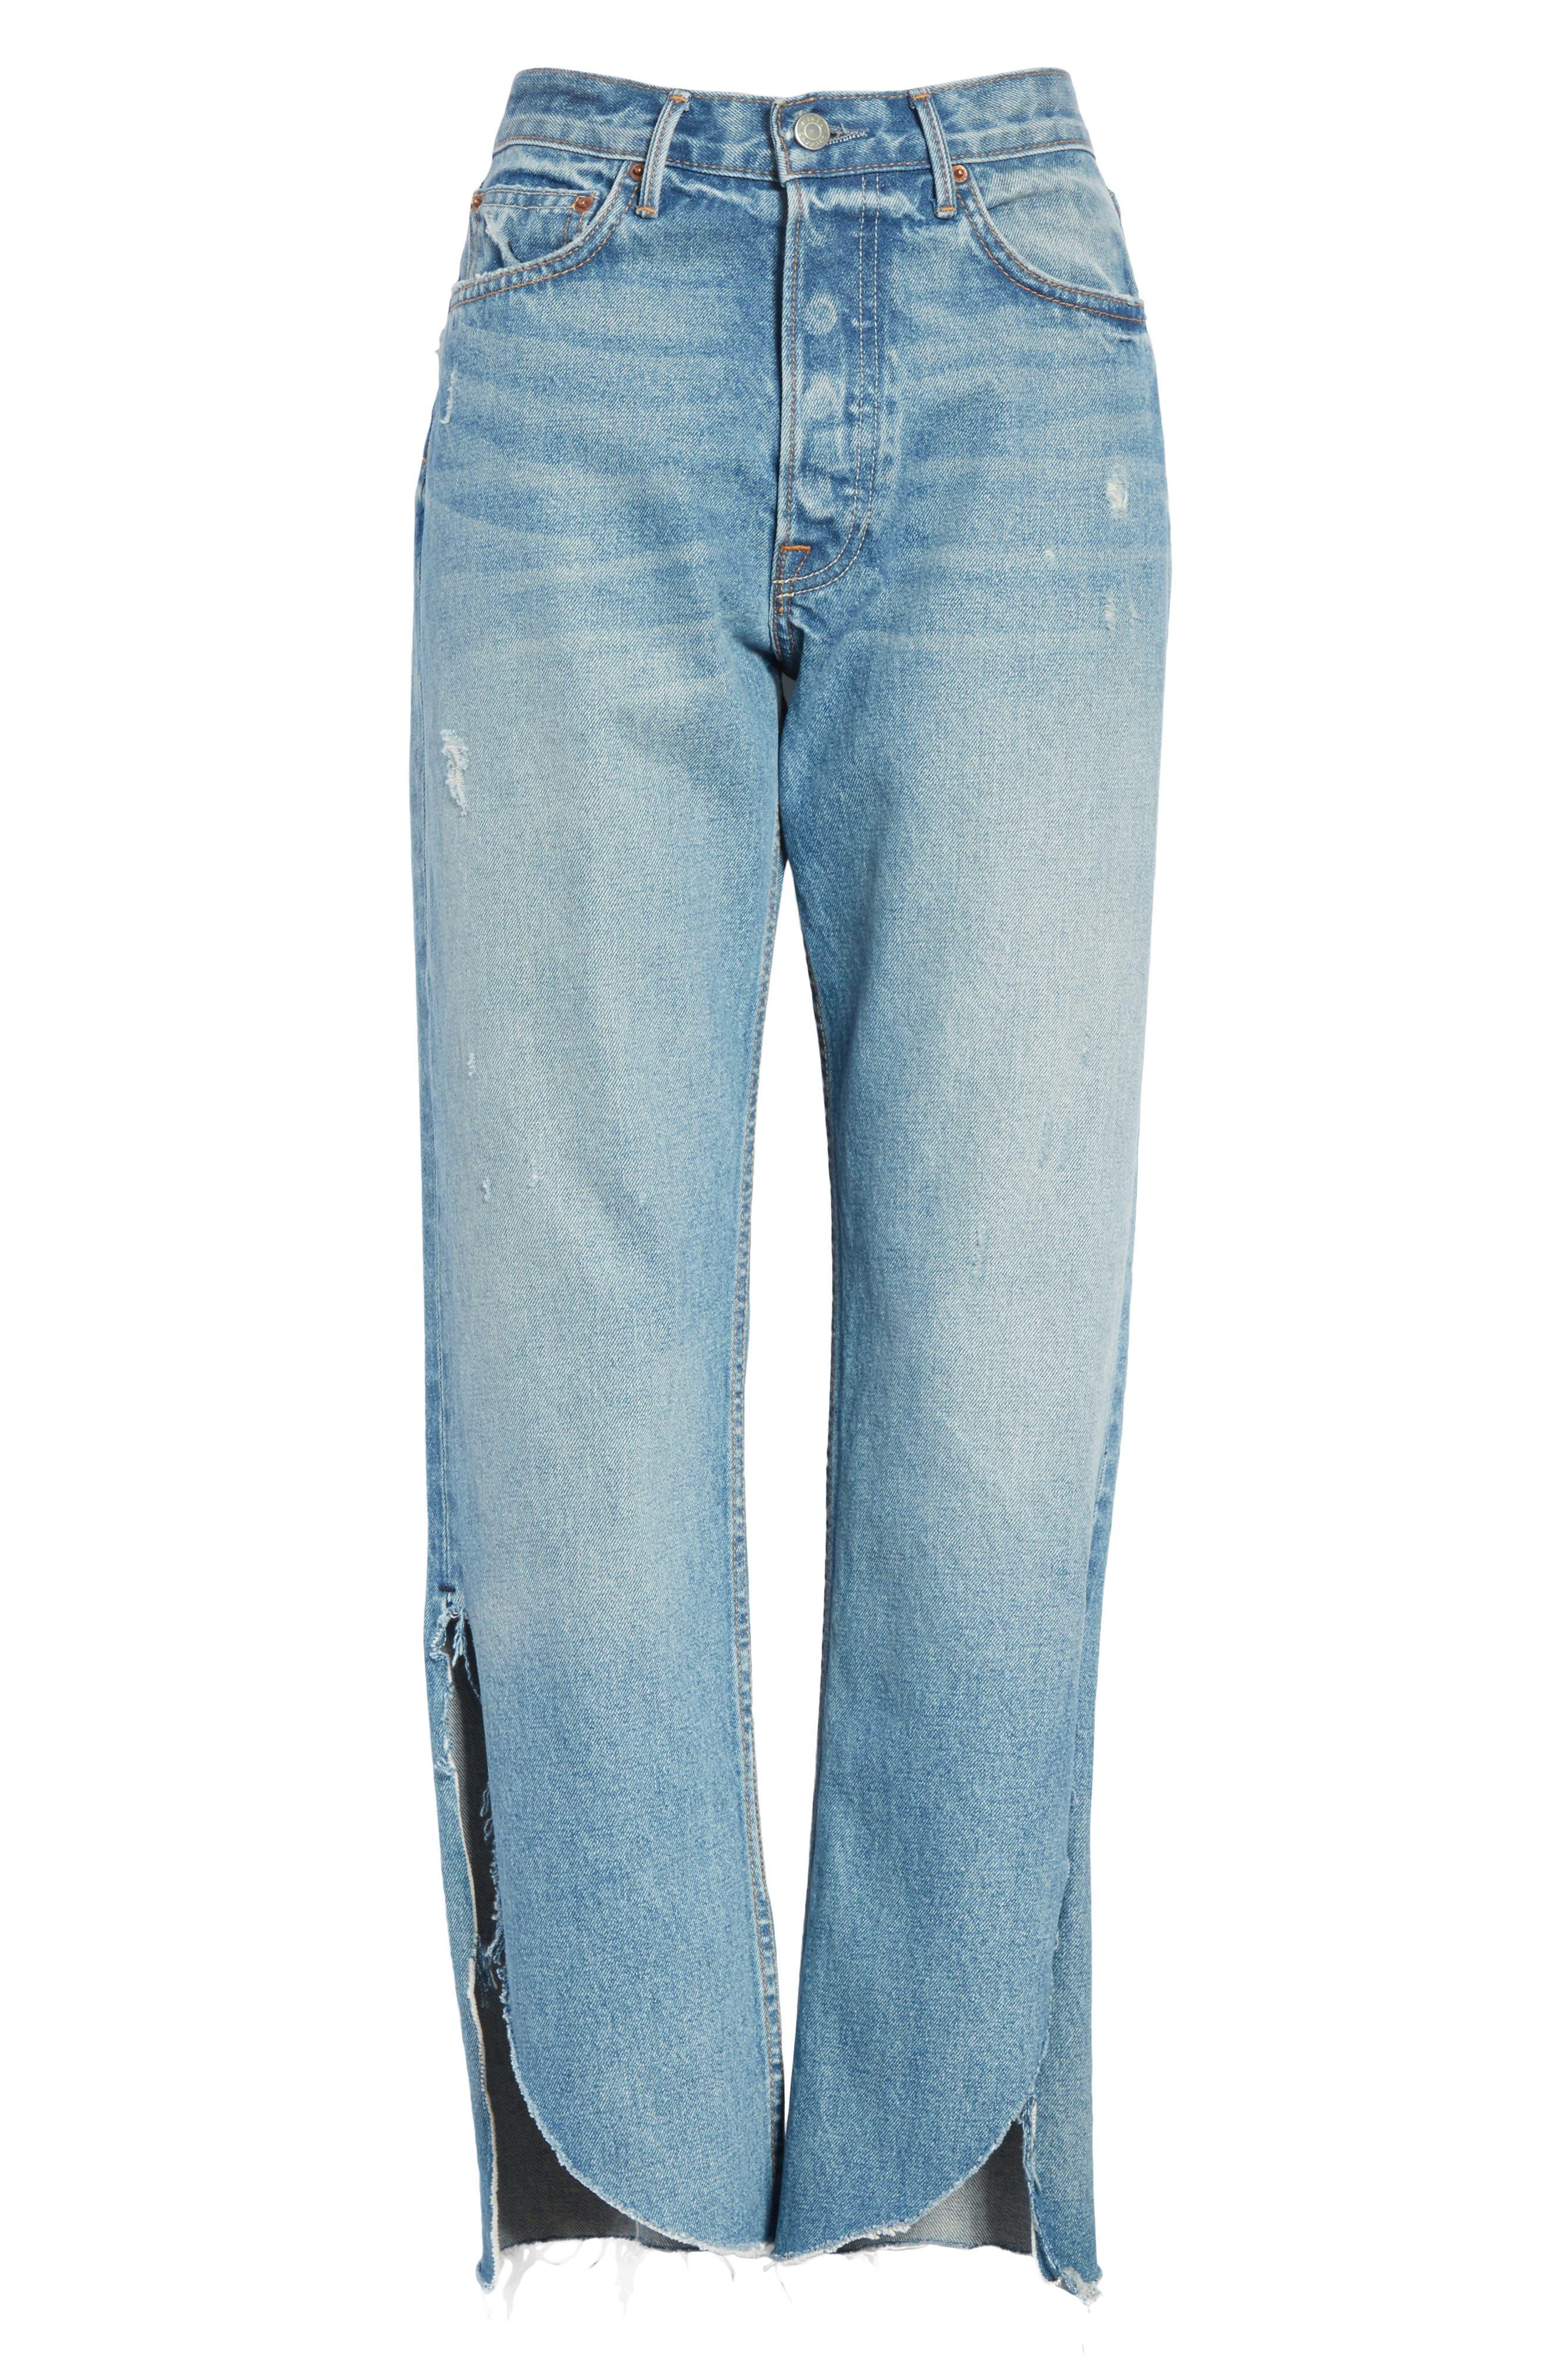 Maran Wide Leg Crop Jeans,                             Alternate thumbnail 6, color,                             483